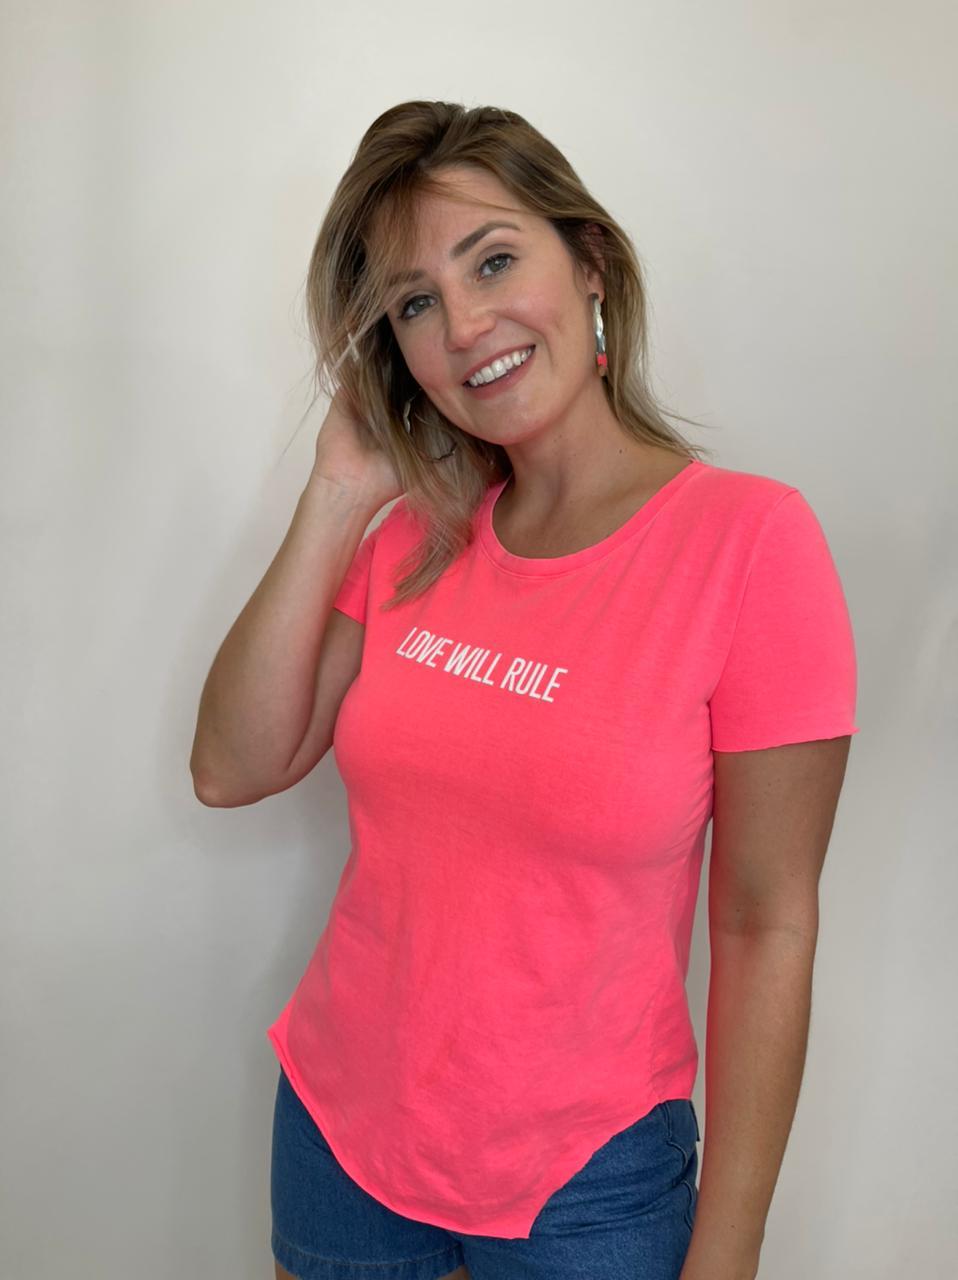 Camiseta de Algodão Love Will Rule Pink